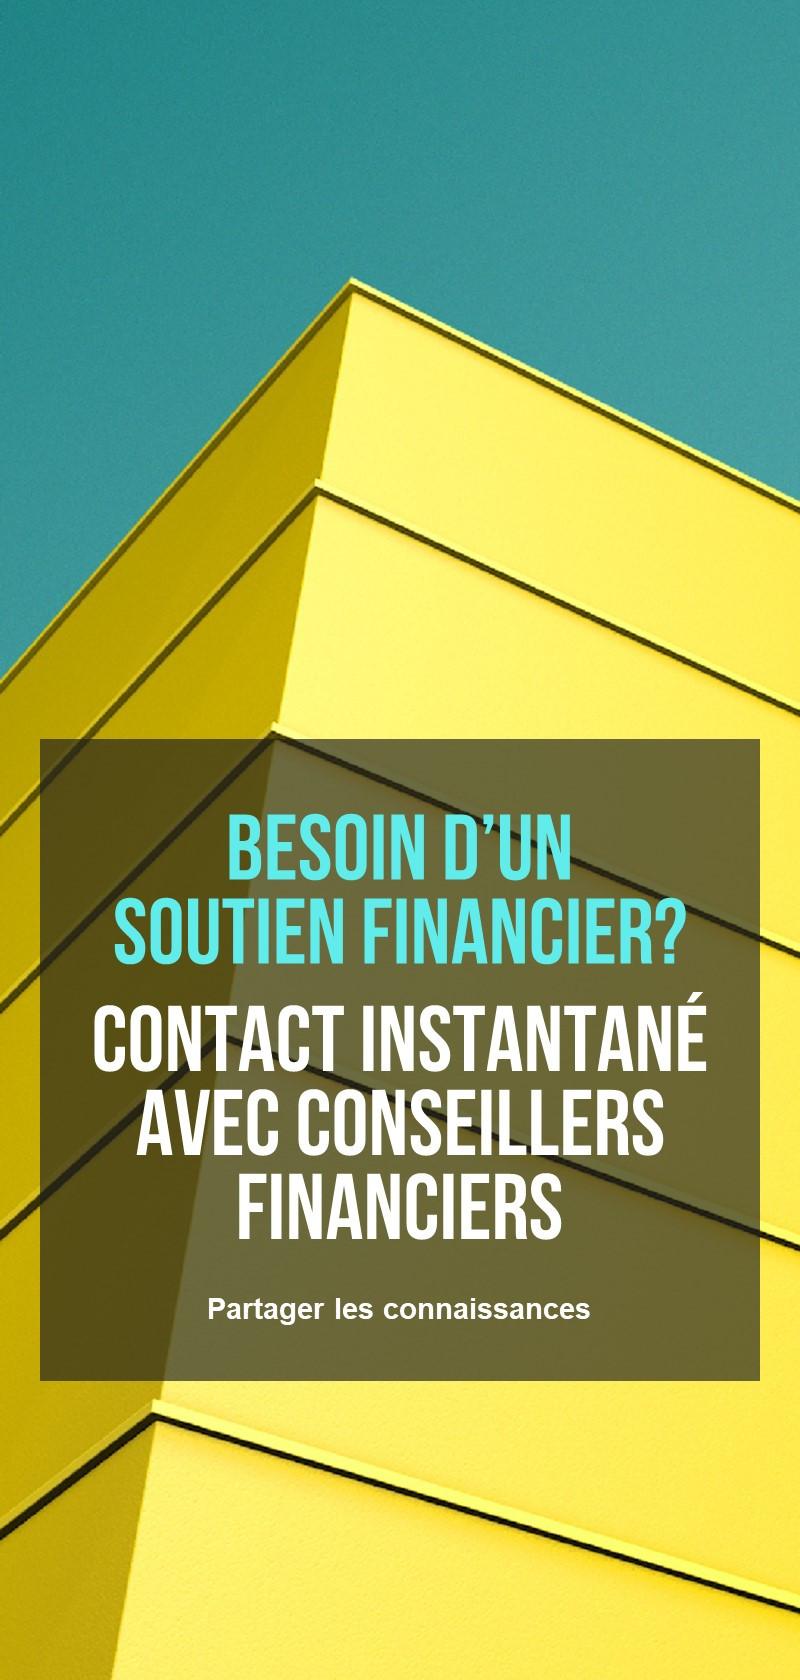 Conseiller financier en ligne